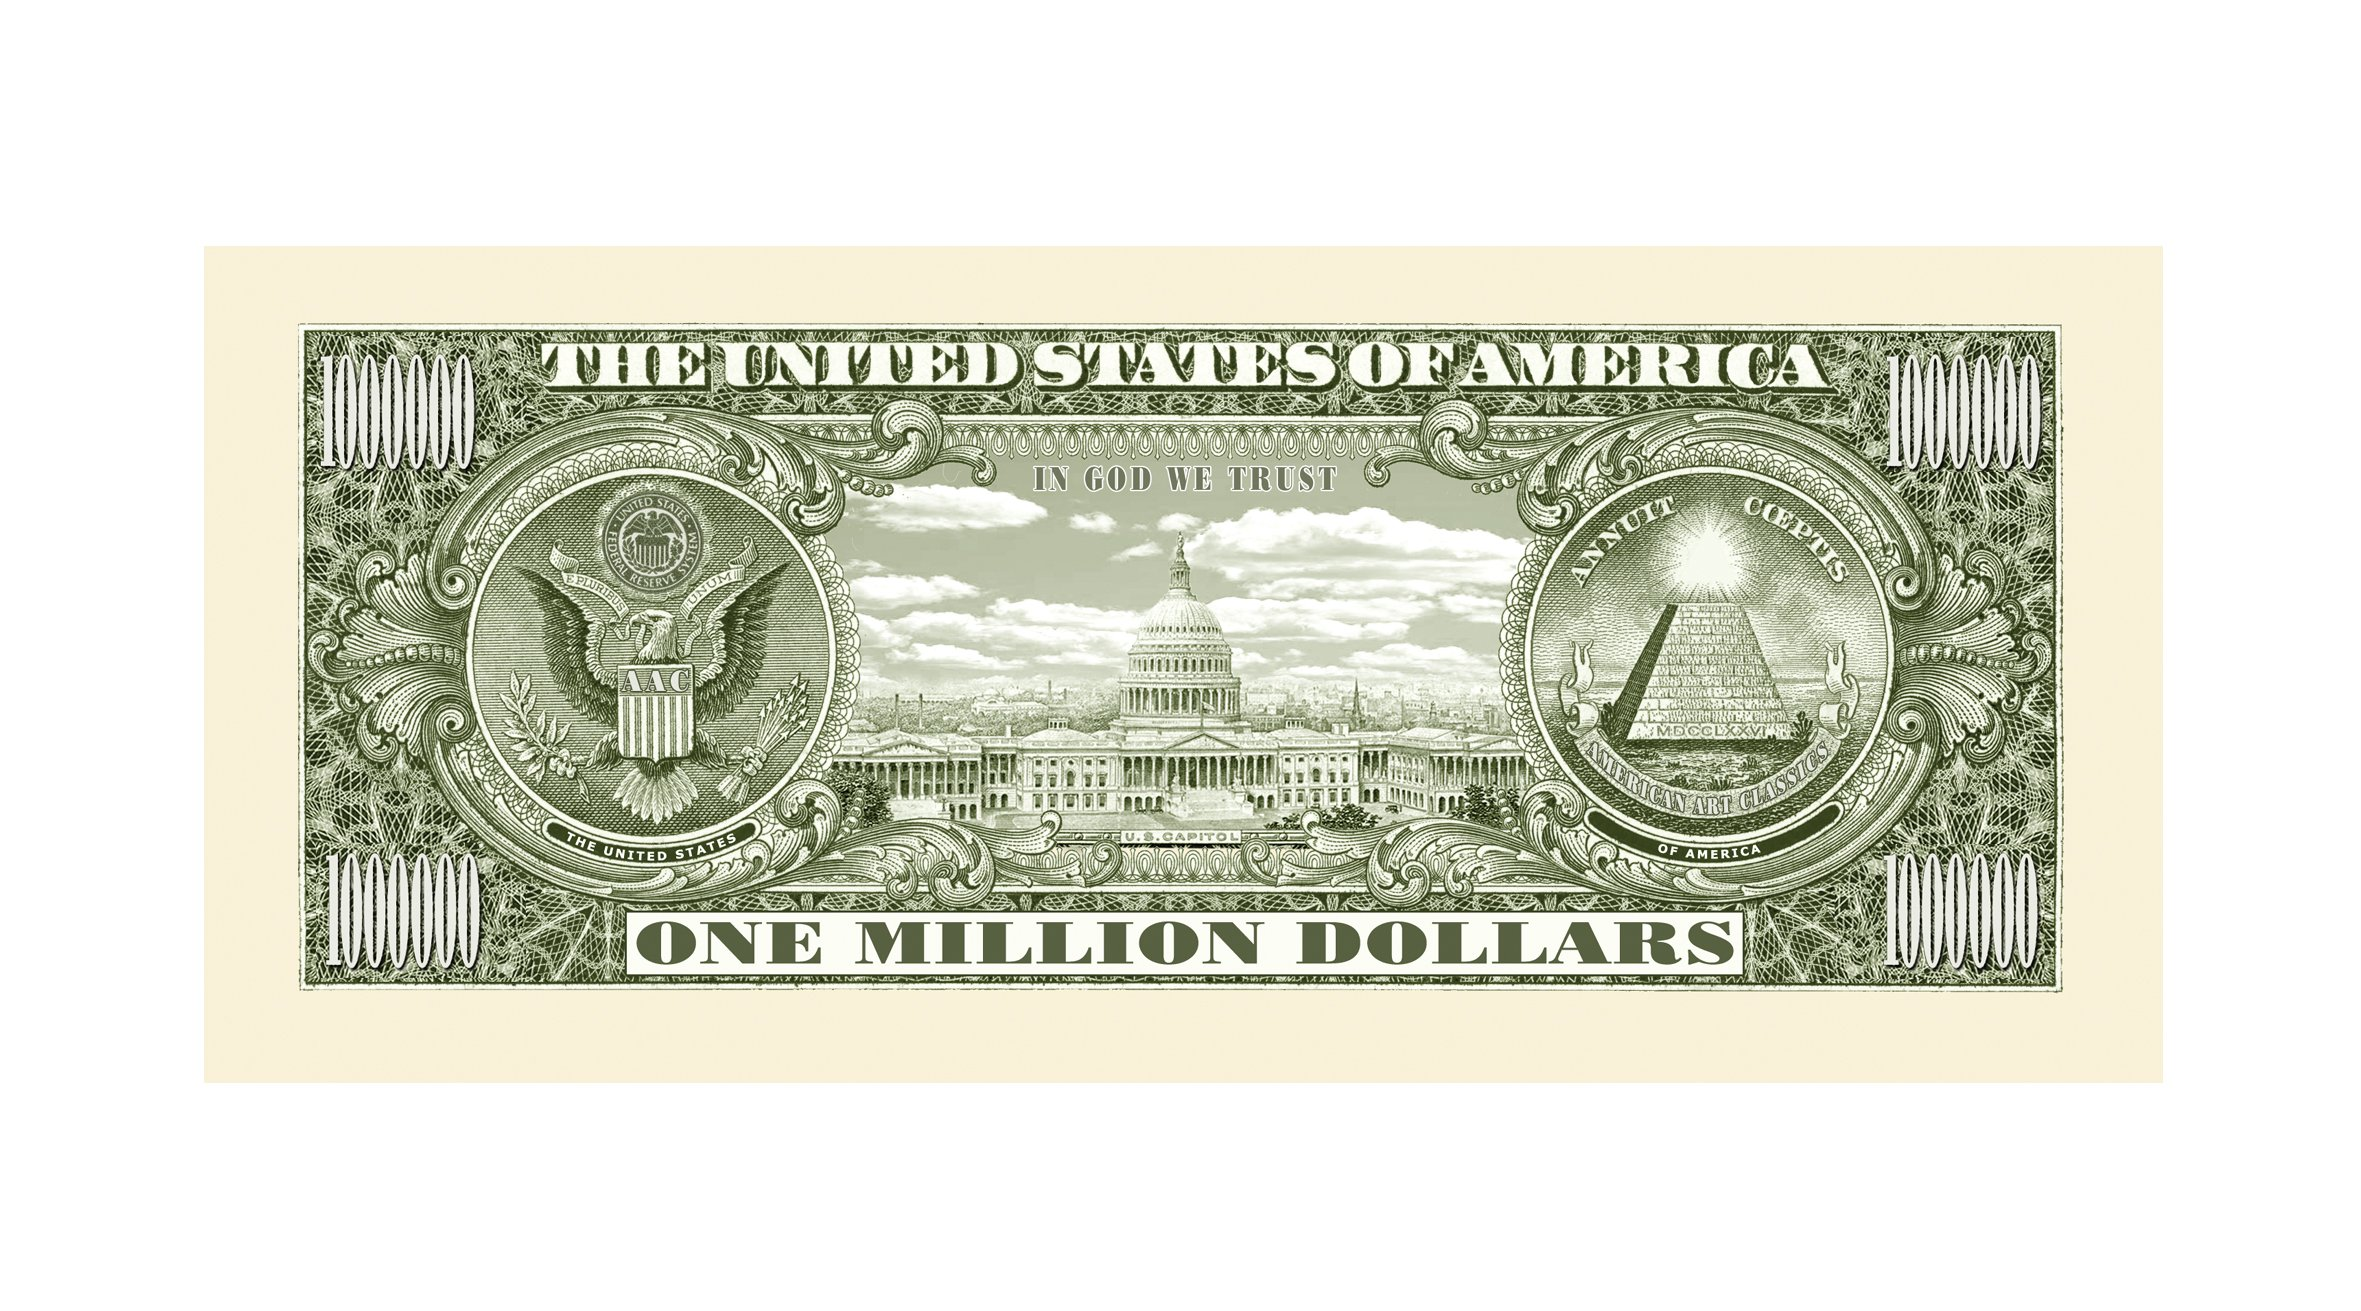 American Art Classics Traditional Million Dollar Bill - Wholesale Pack of 1000 Bills by American Art Classics (Image #3)